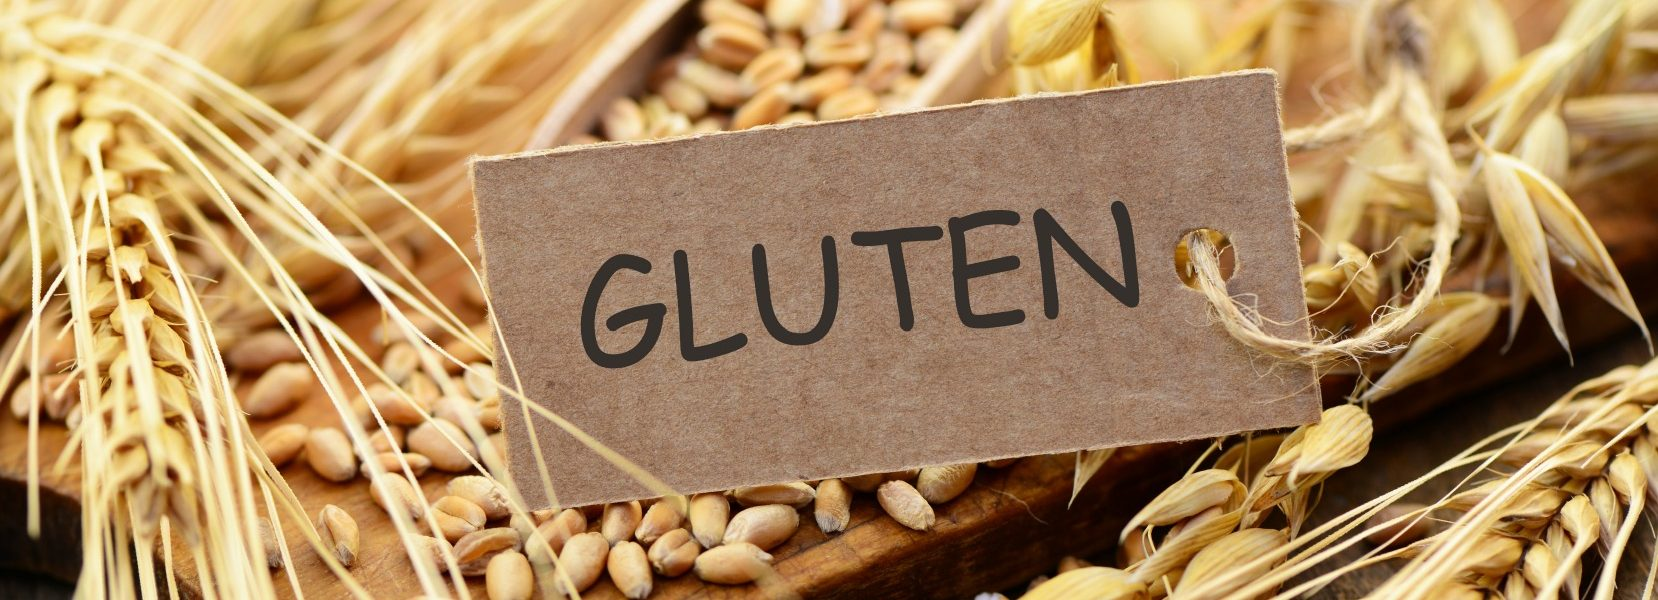 Gluten free dating founder